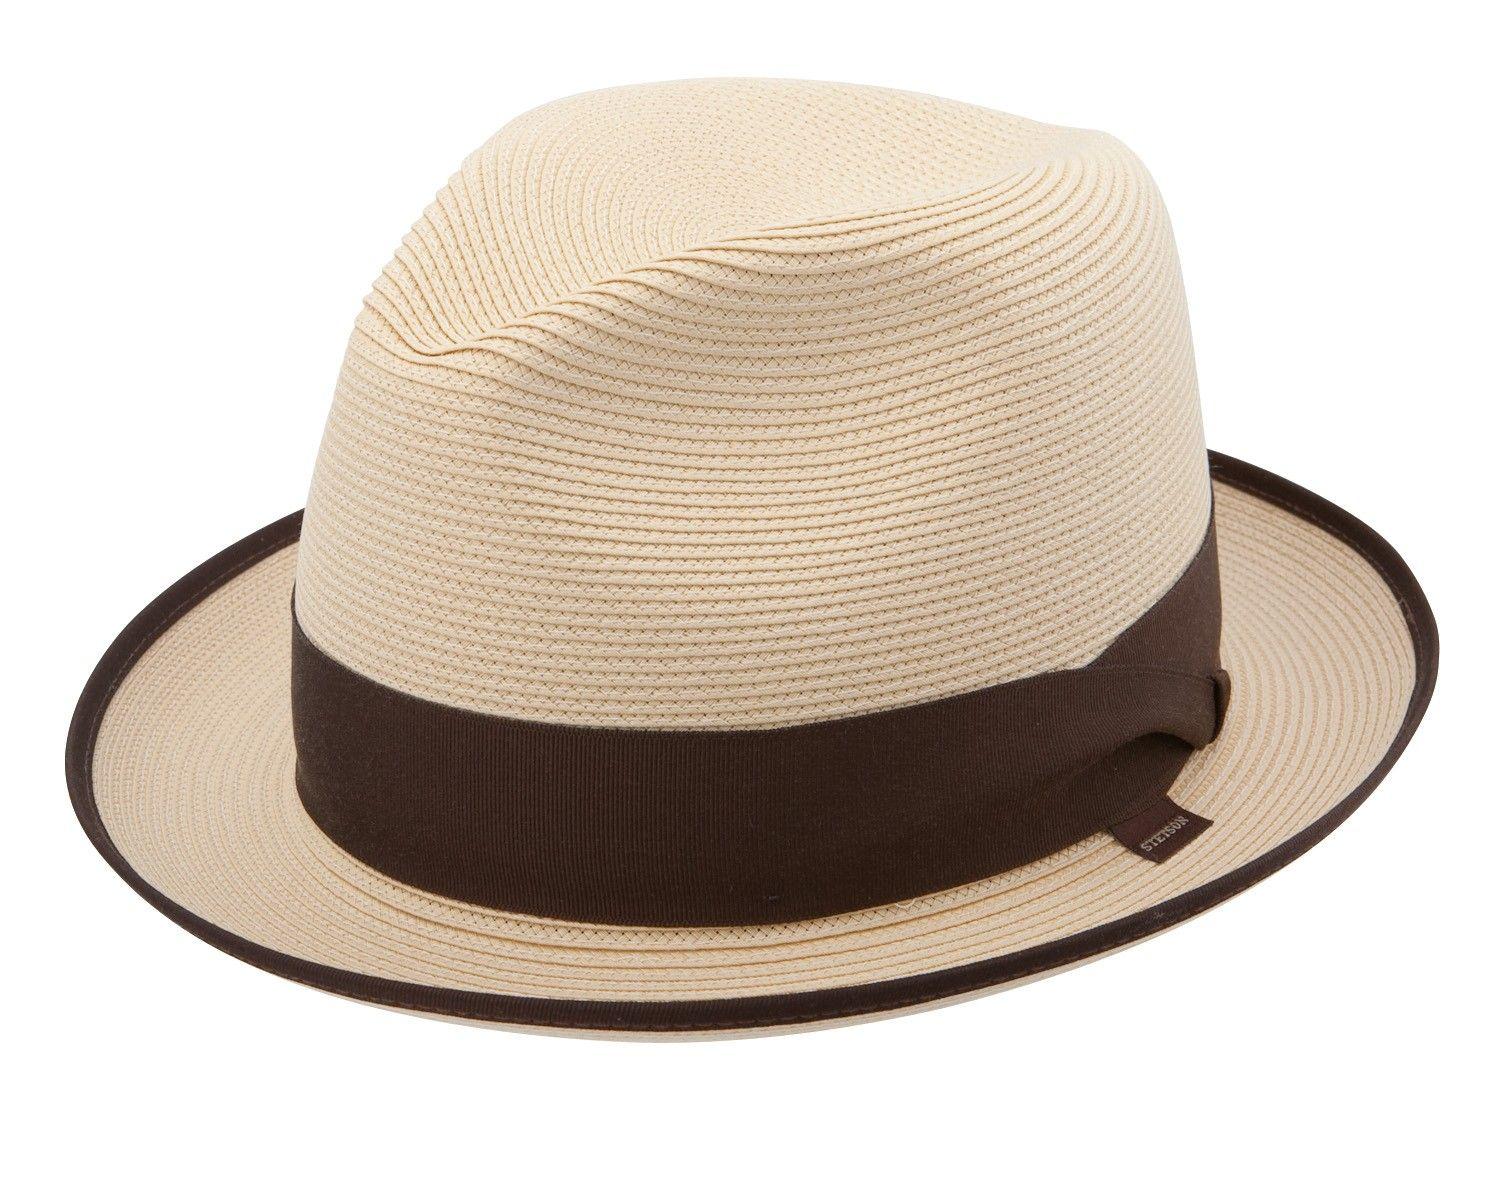 0ef064698 Stetson Latte Milan Braid Straw Fedora | Hats in 2019 | Straw fedora ...